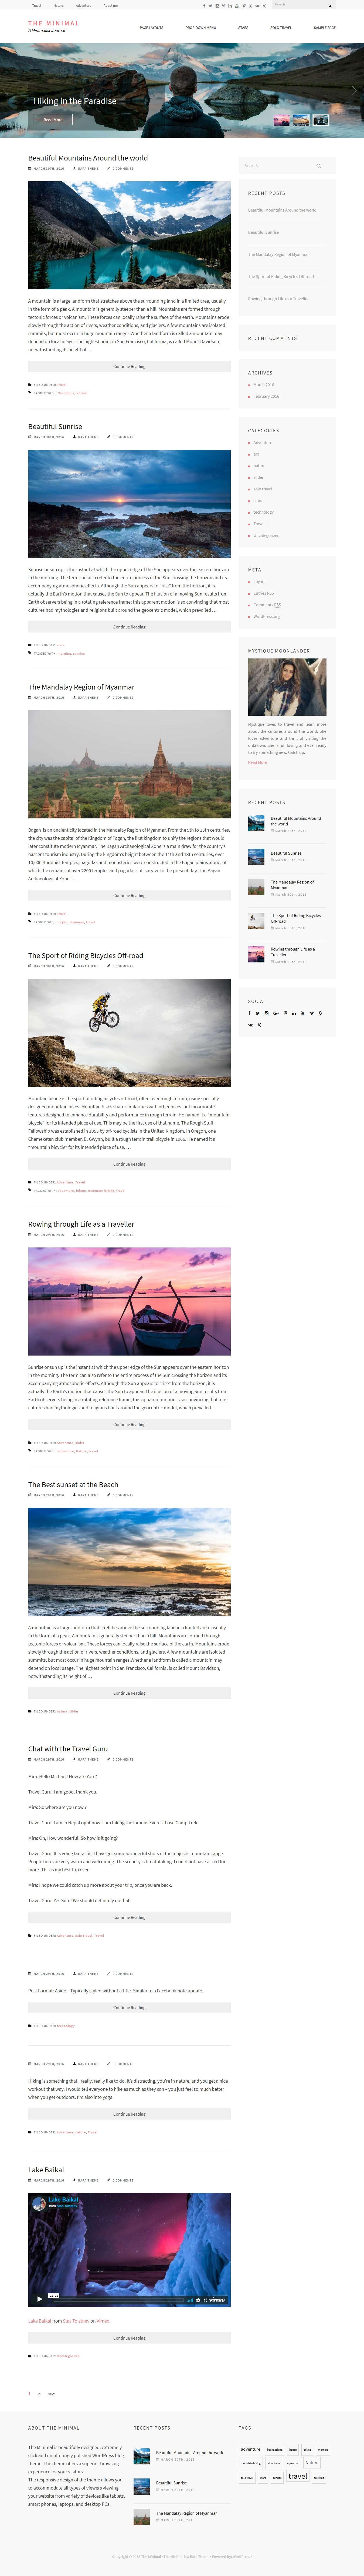 The Minimal – Best Free Minimal WordPress Theme